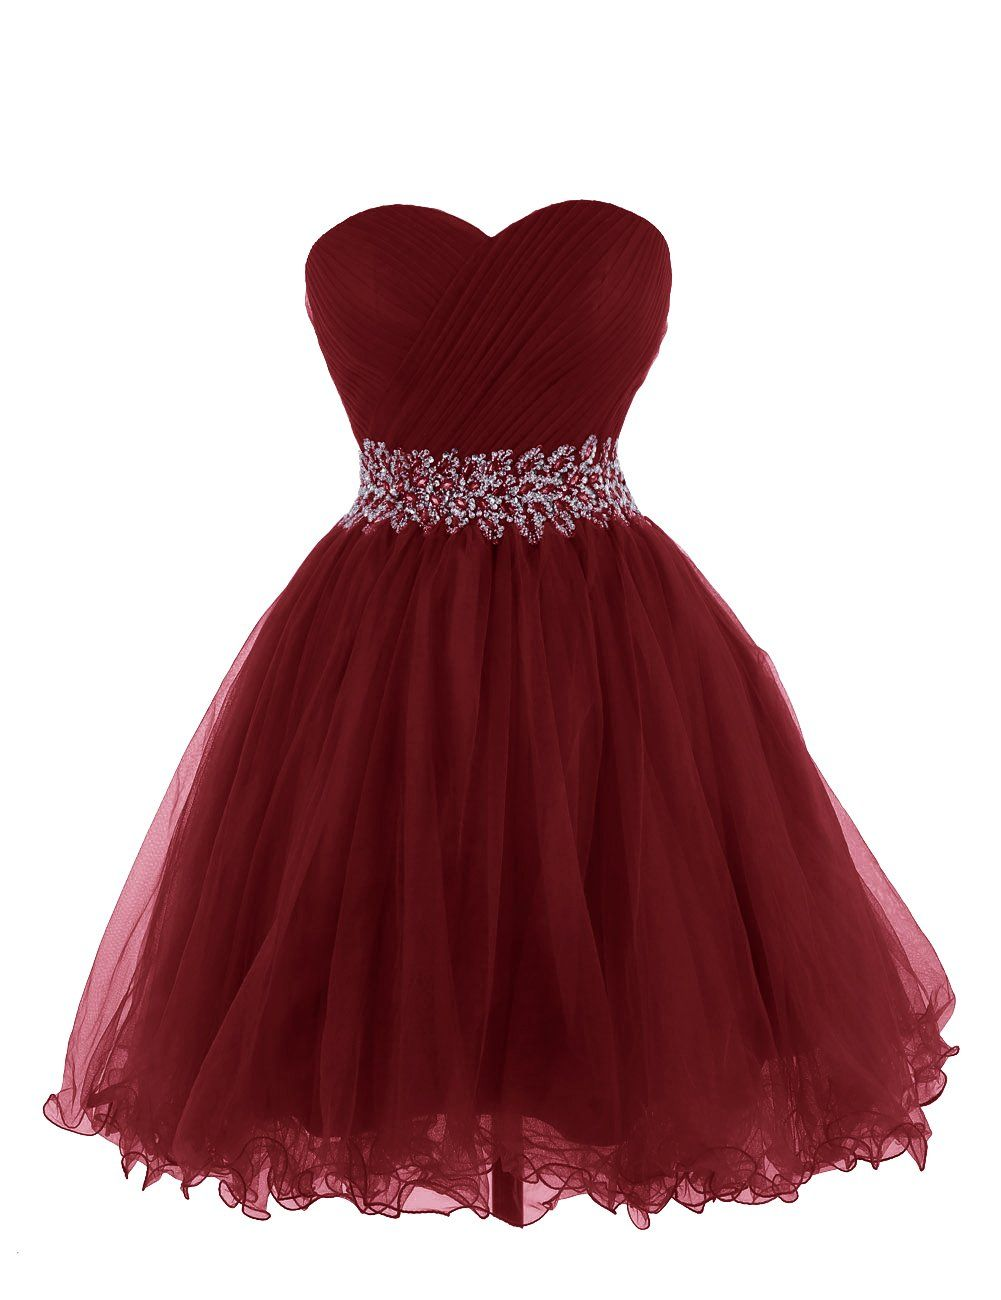 Dresses For Semi Formal Dances